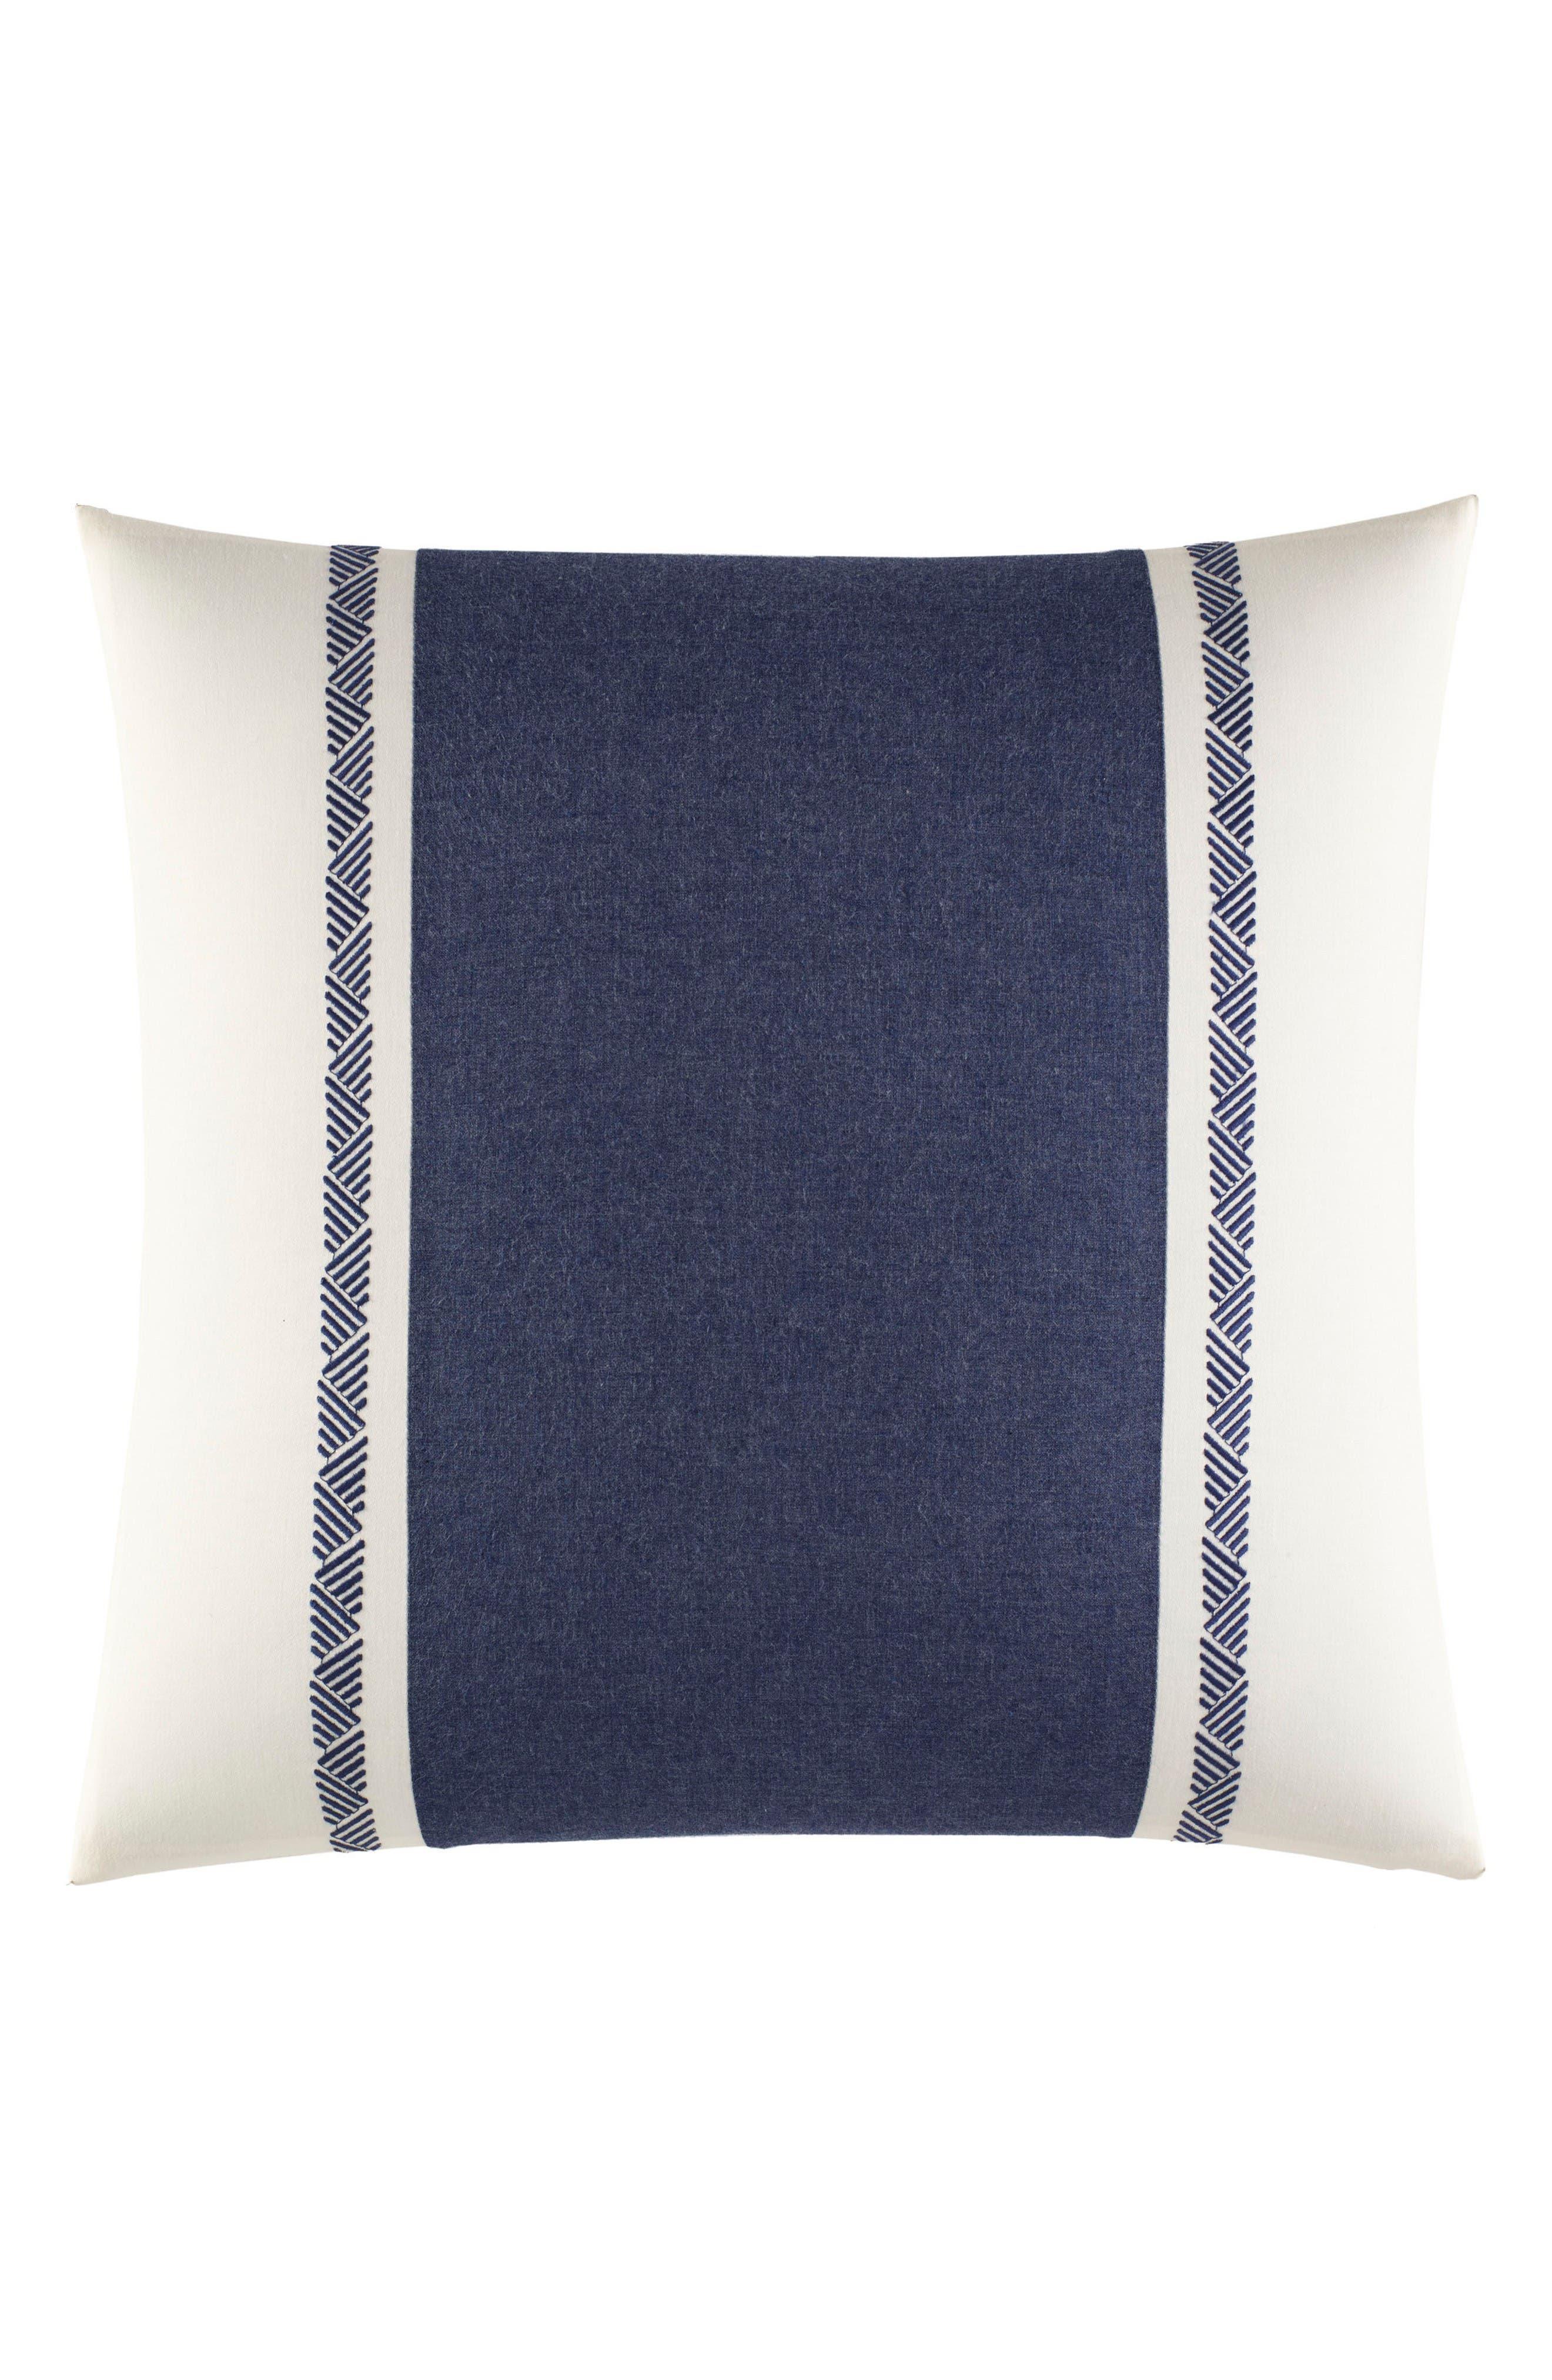 Main Image - Nautica Cunningham Accent Pillow